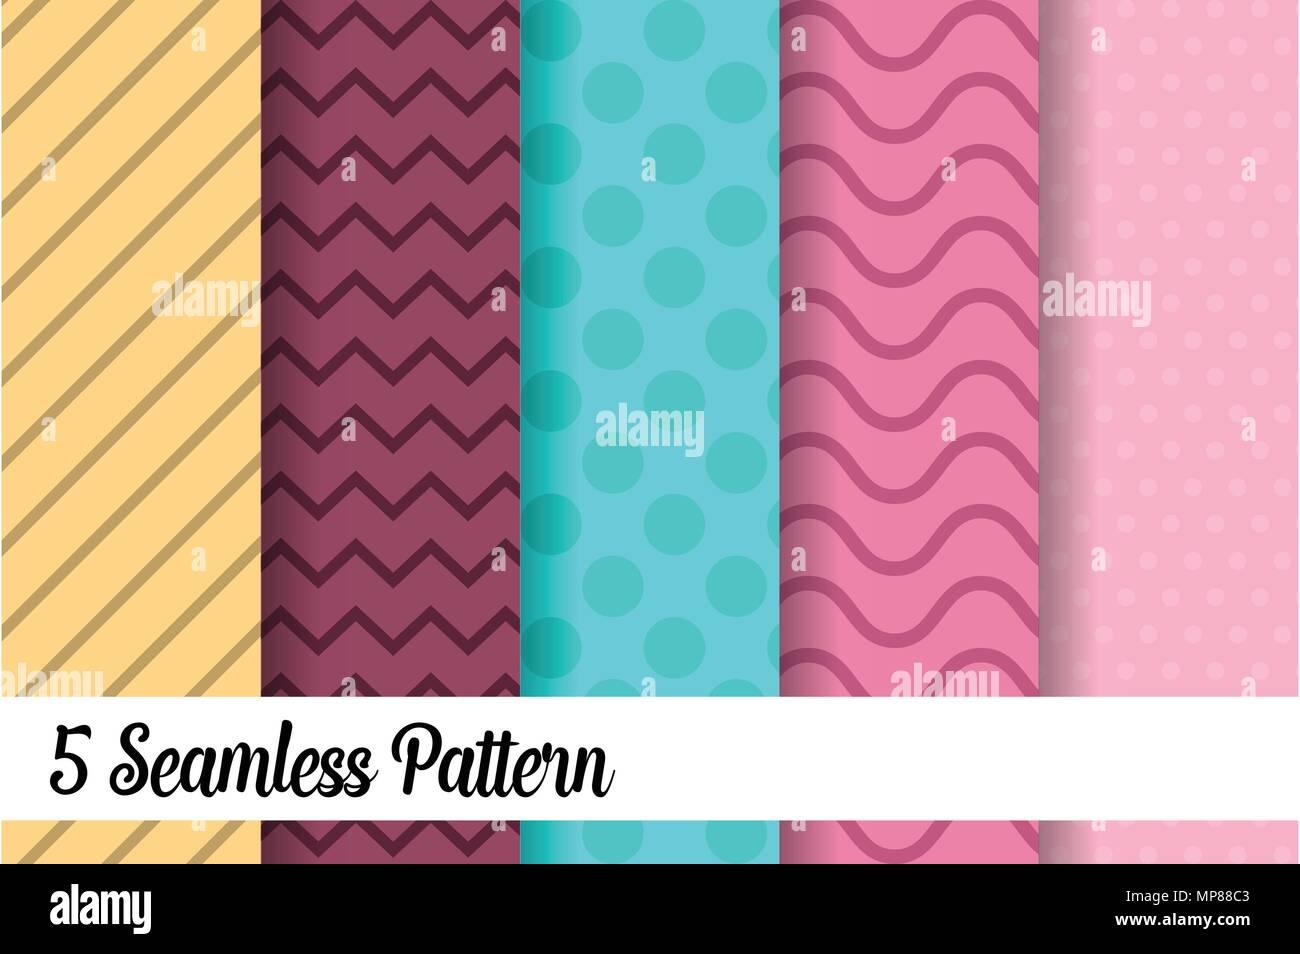 5 seamless pattern set fashion abstract paper art trending artwork - Stock Image